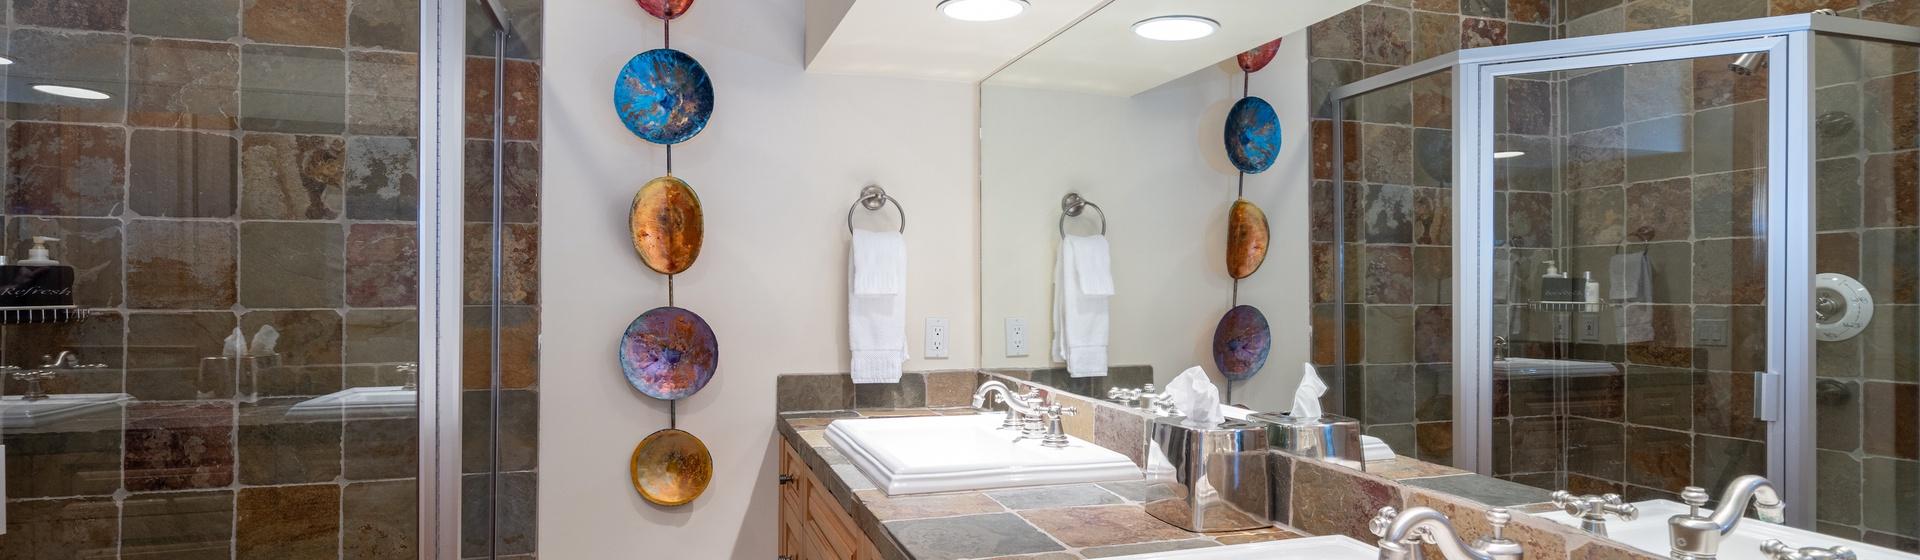 11-Telluride-Pine-Street-Penthouse-A-Guest-Bath-1